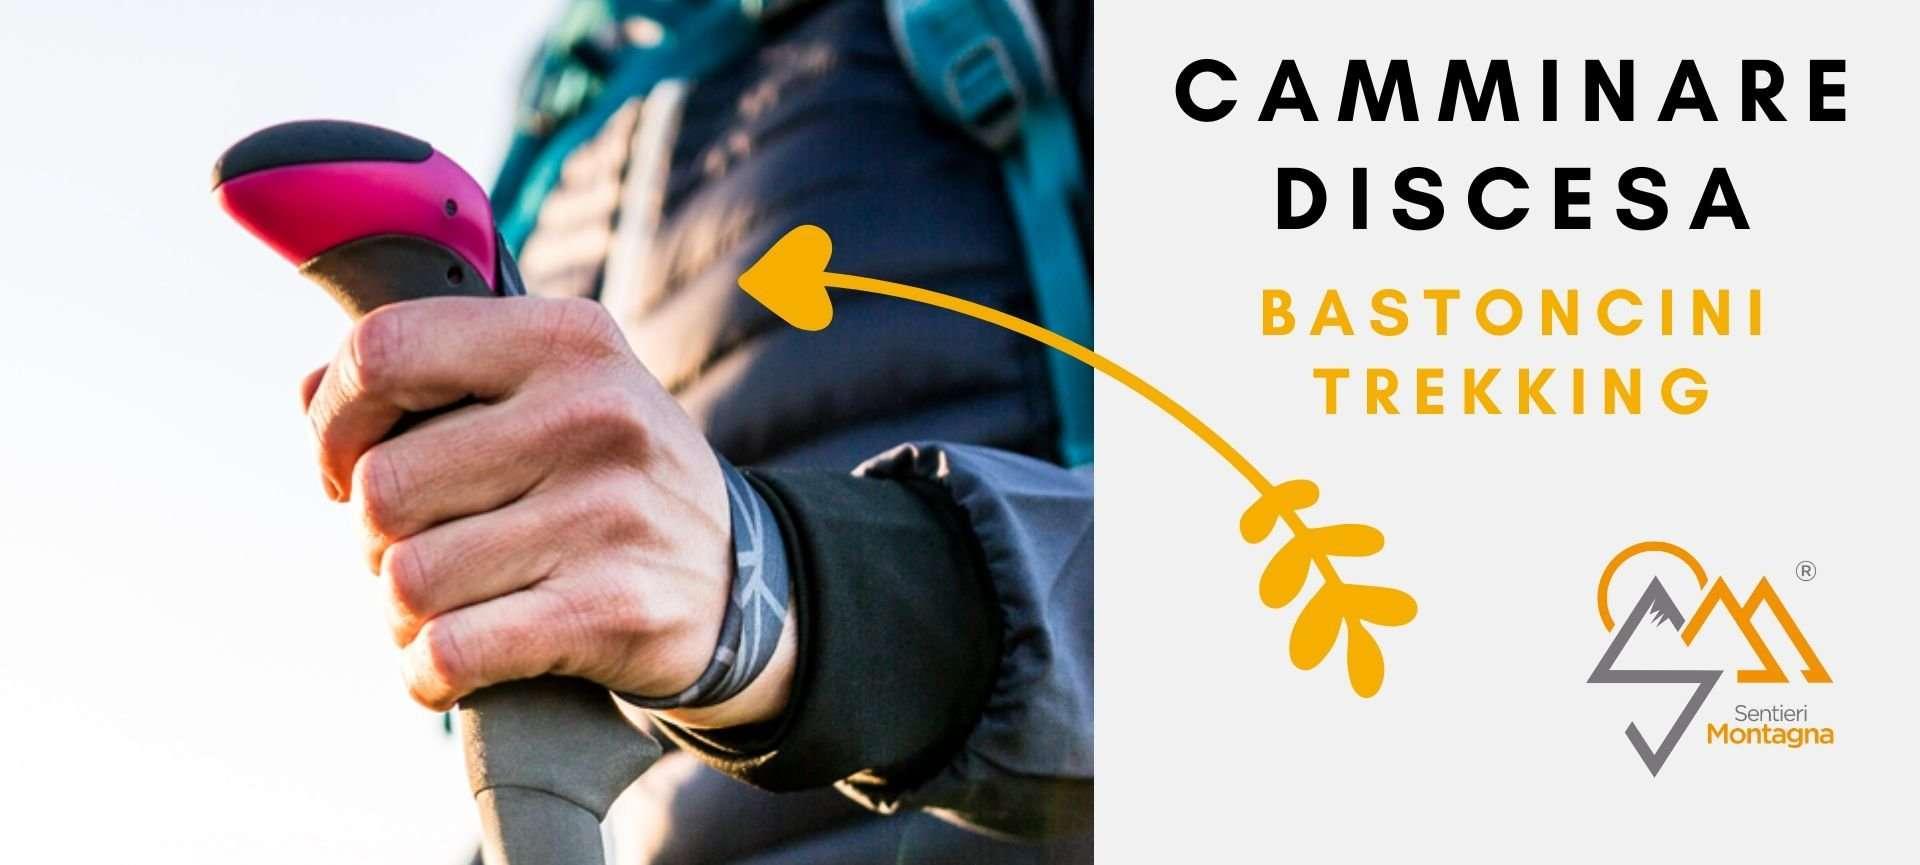 camminare in discesa in montagna: uso bastoncini trekking